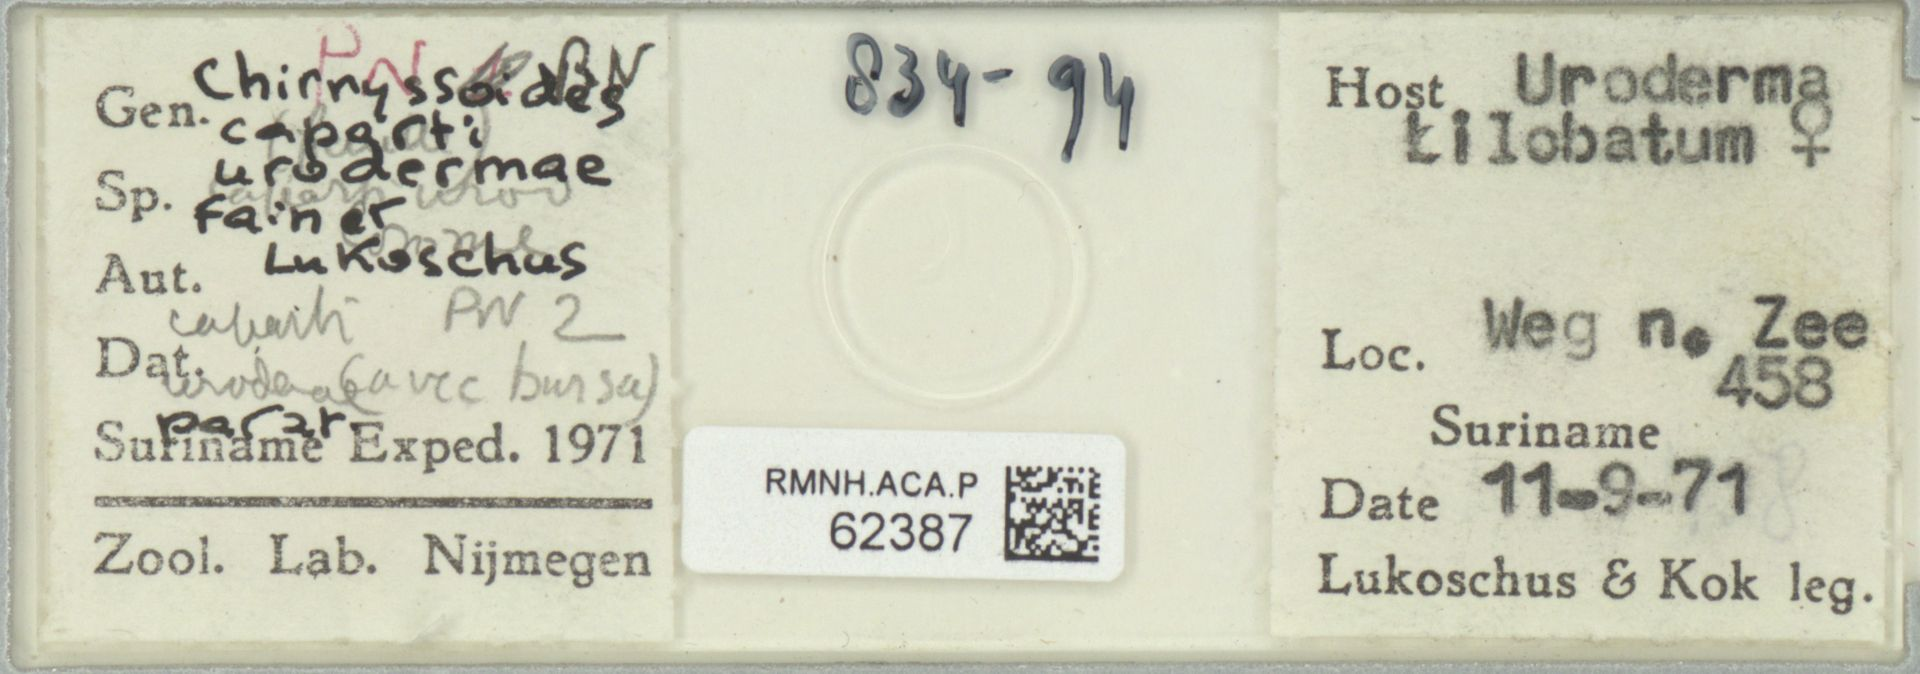 RMNH.ACA.P.62387 | Chirnyssoides caparti urodermae Fain & Lukoschus